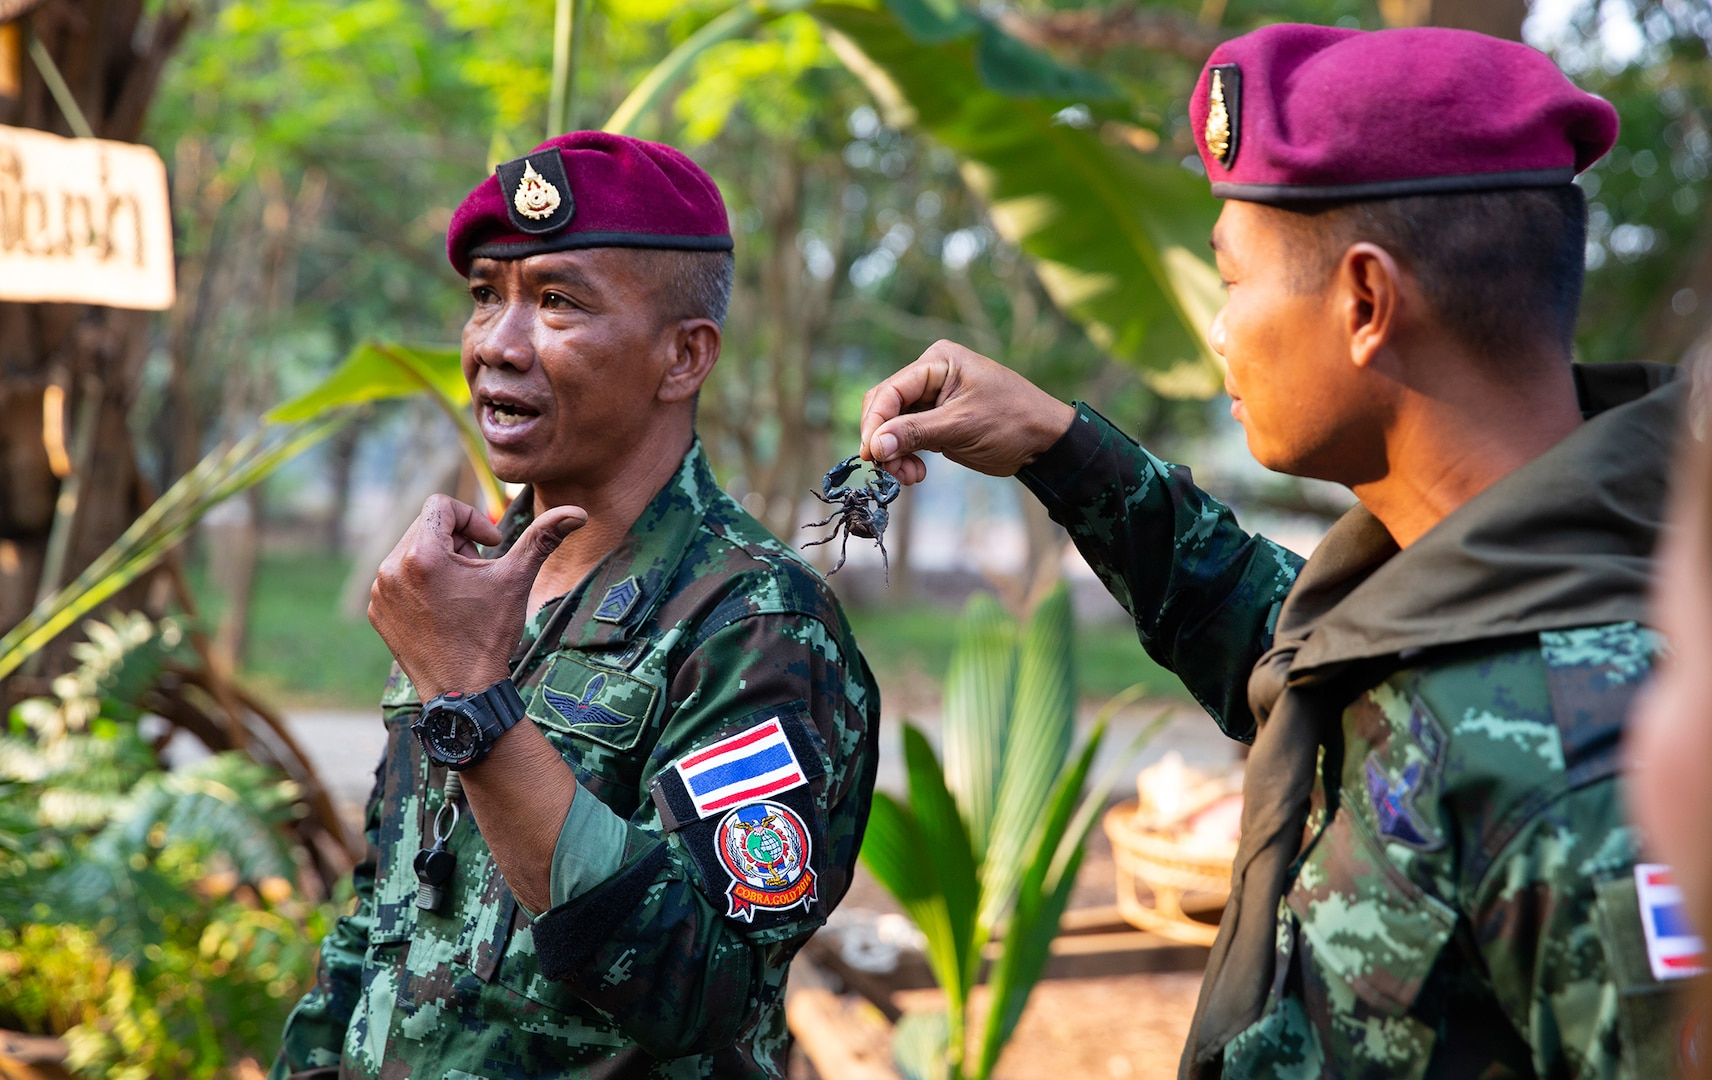 U.S., Thai Soldiers Train on Jungle Survival, Basic Rifle Marksmanship, Room Clearing Procedures